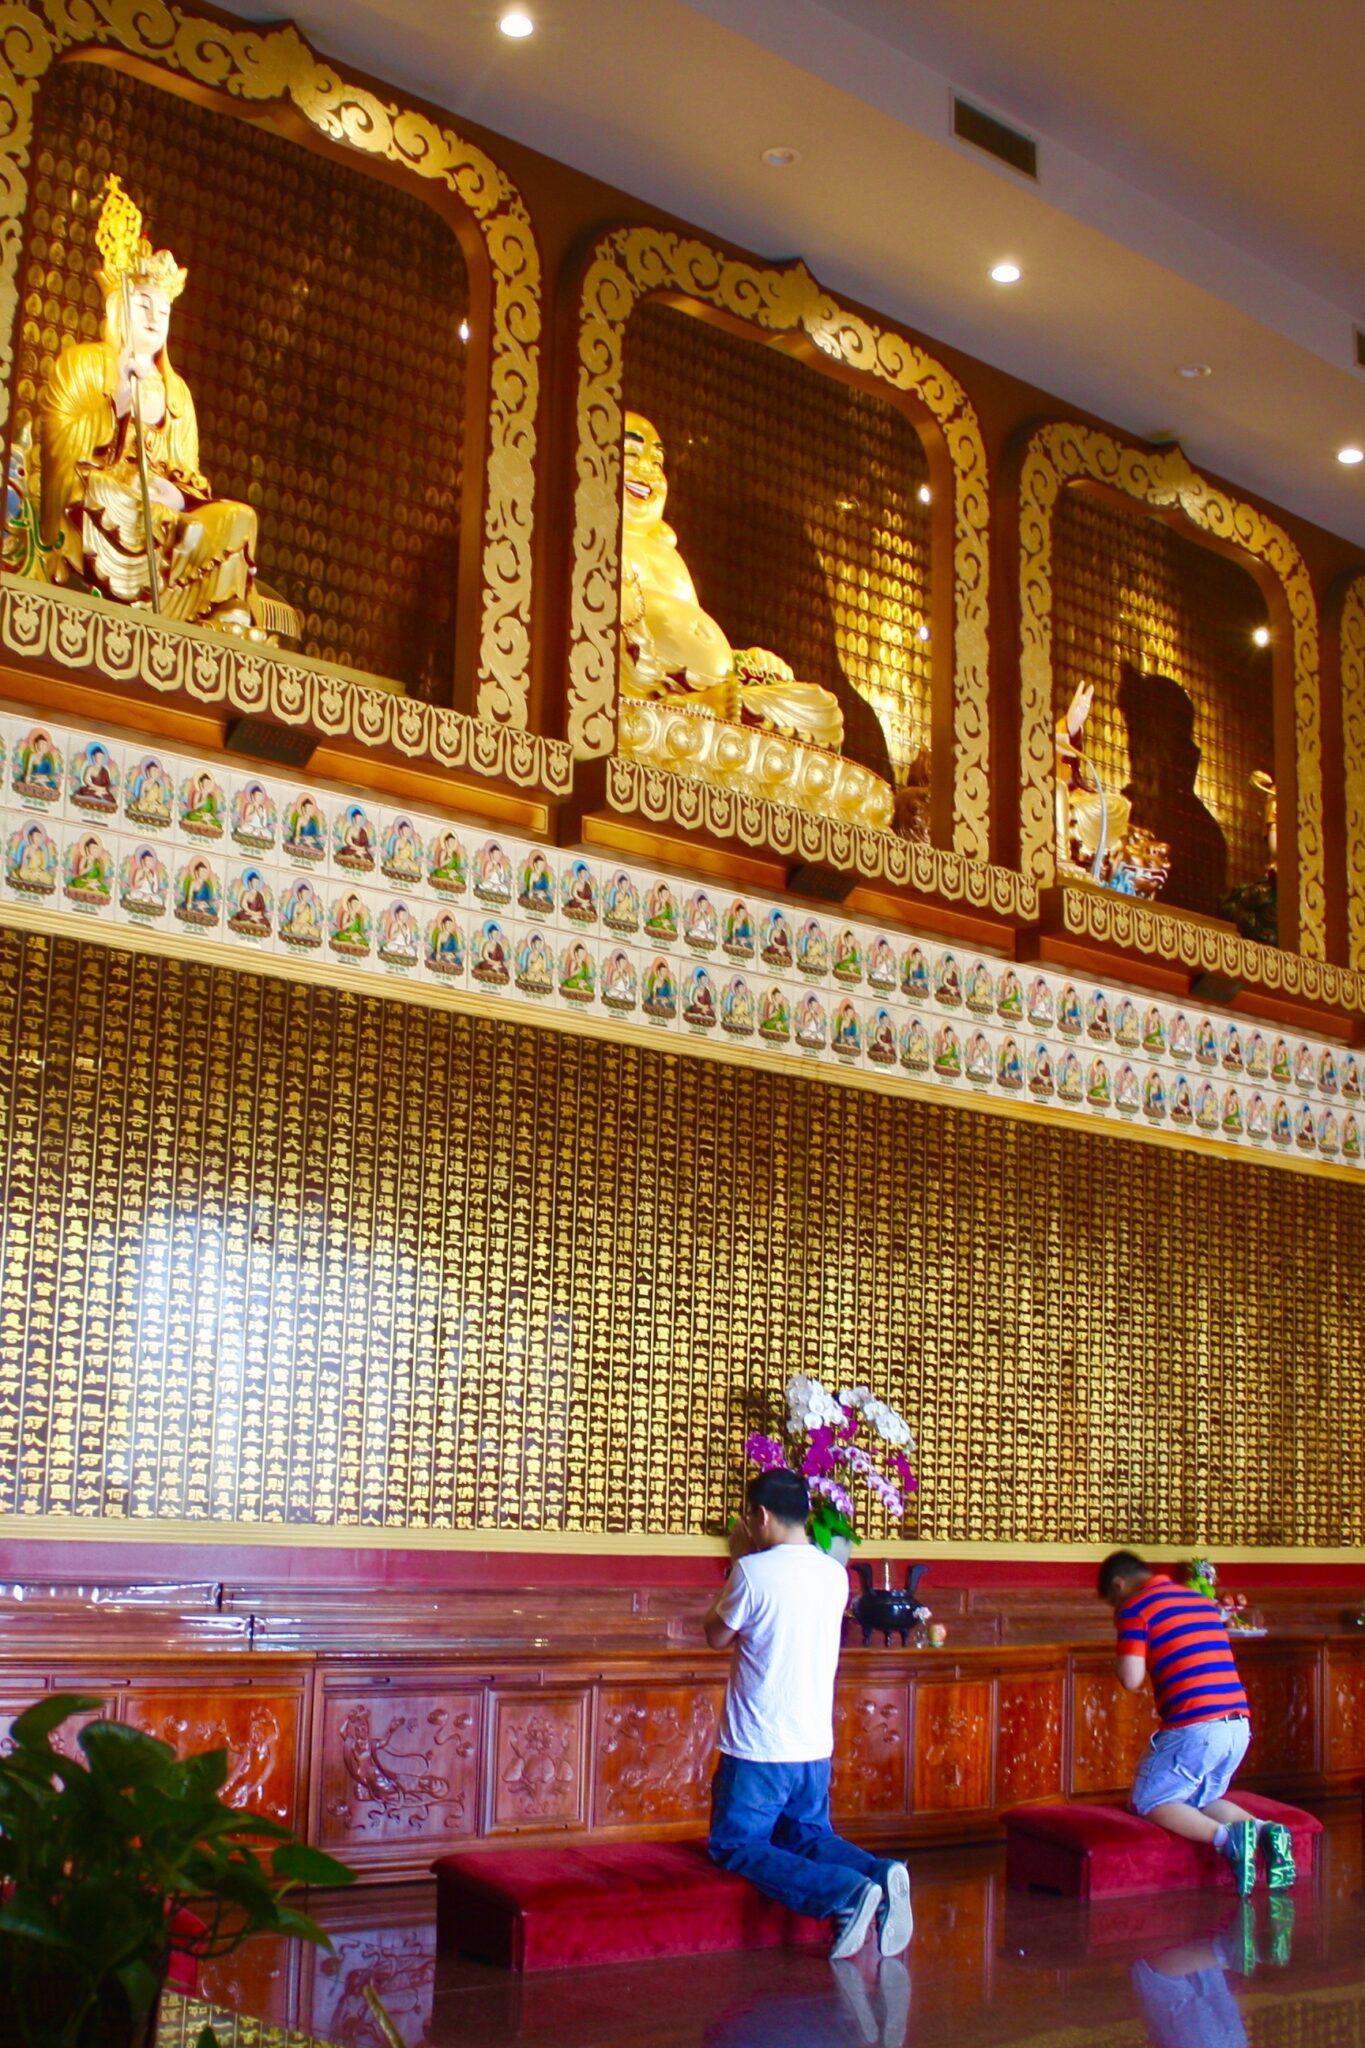 Prayer at the entrance